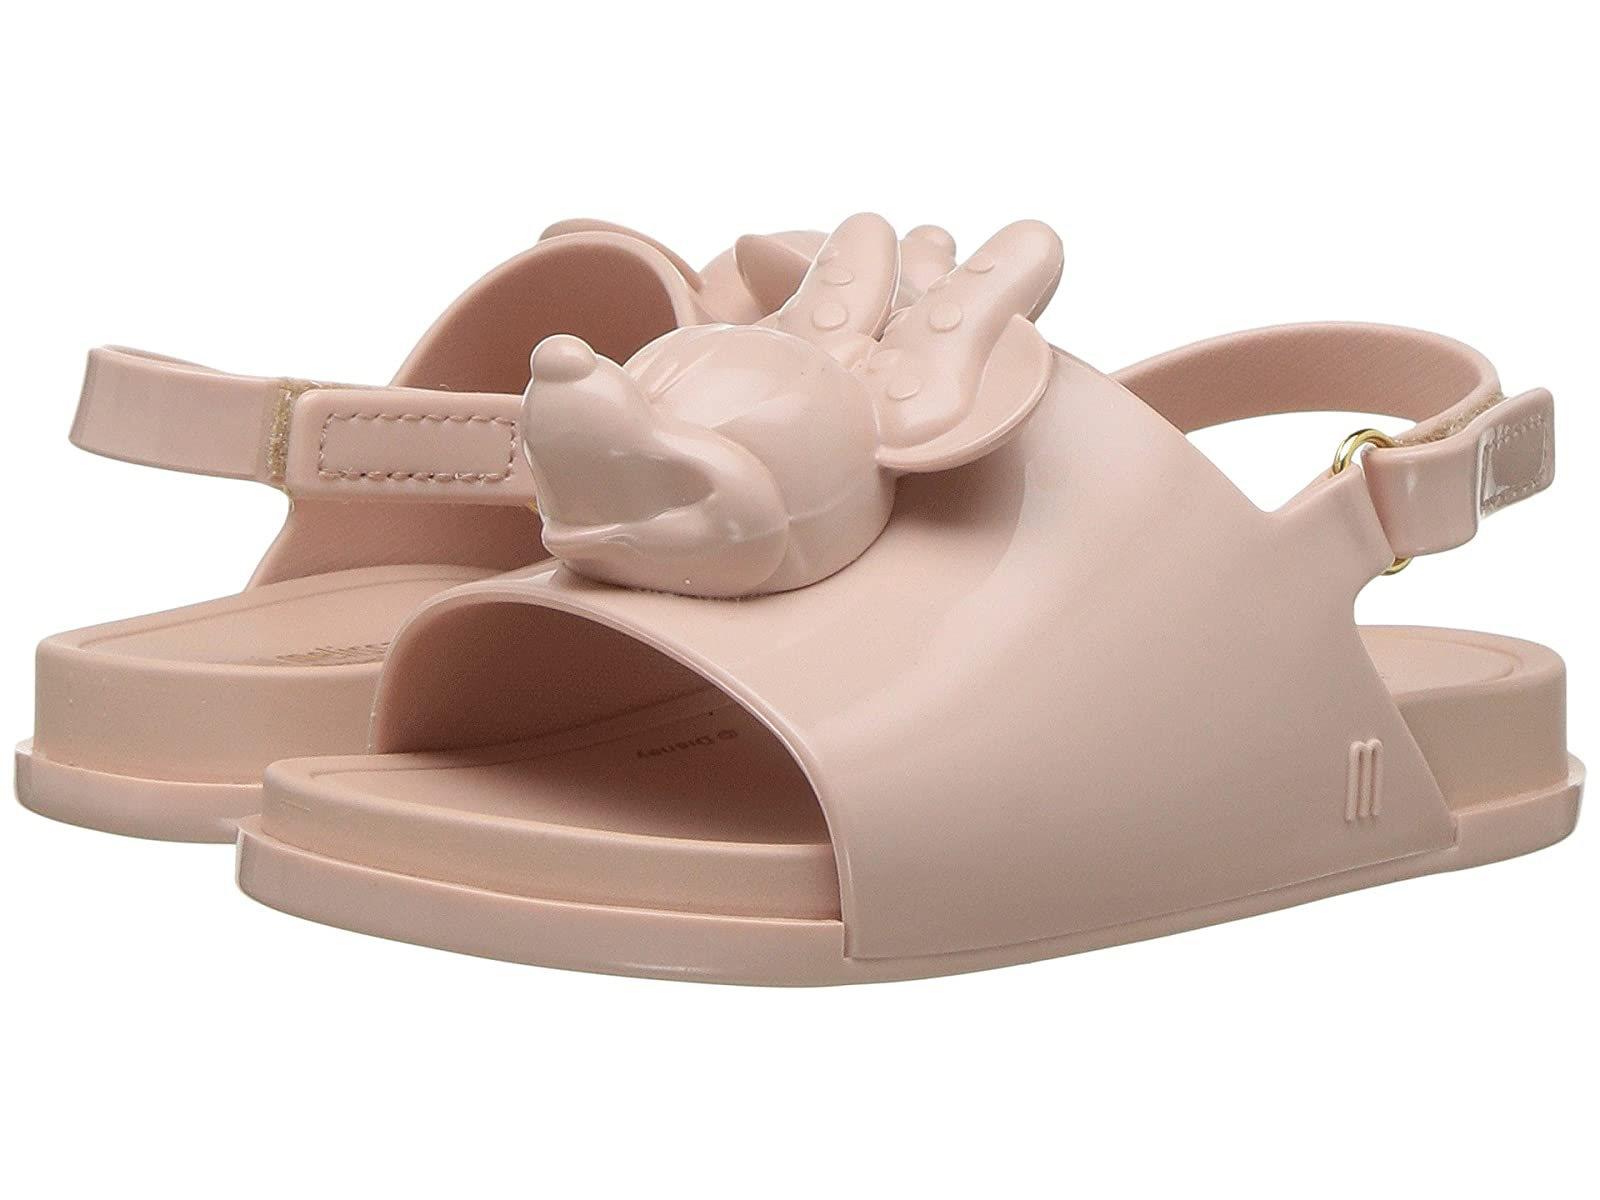 Mini Melissa Mini Beach Slide Sandal + Disney (Toddler/Little Kid)Cheap and distinctive eye-catching shoes